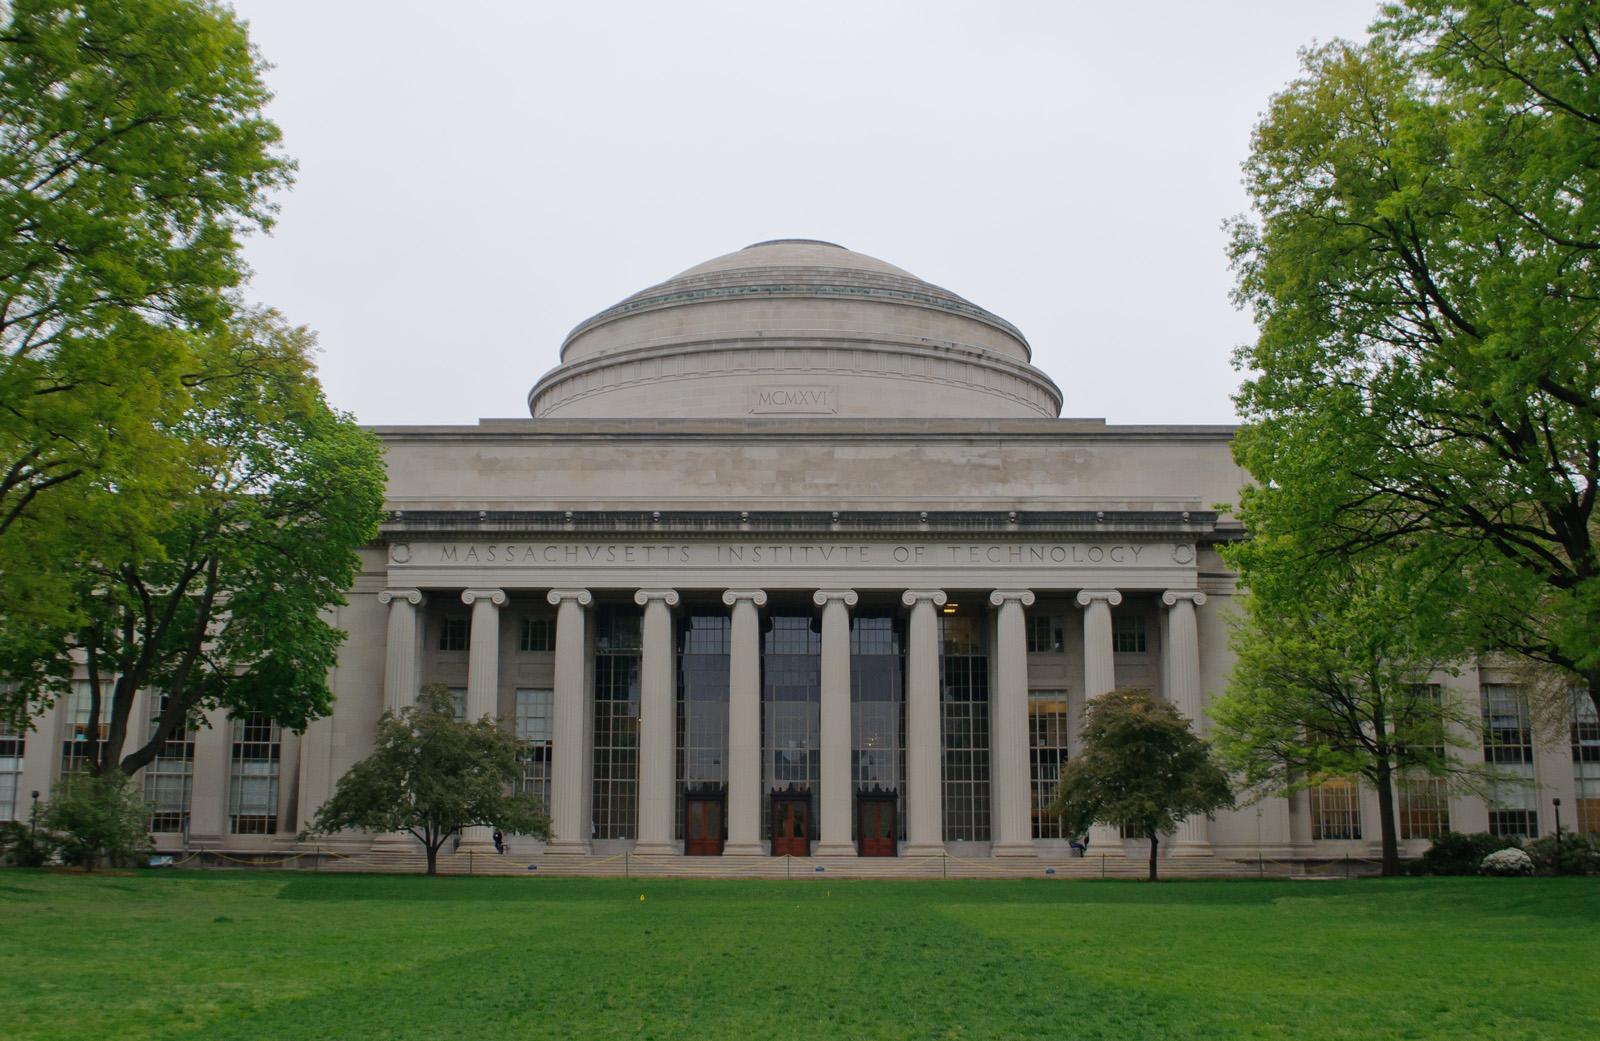 Massachusetts_Institute_of_Technology_7194419730